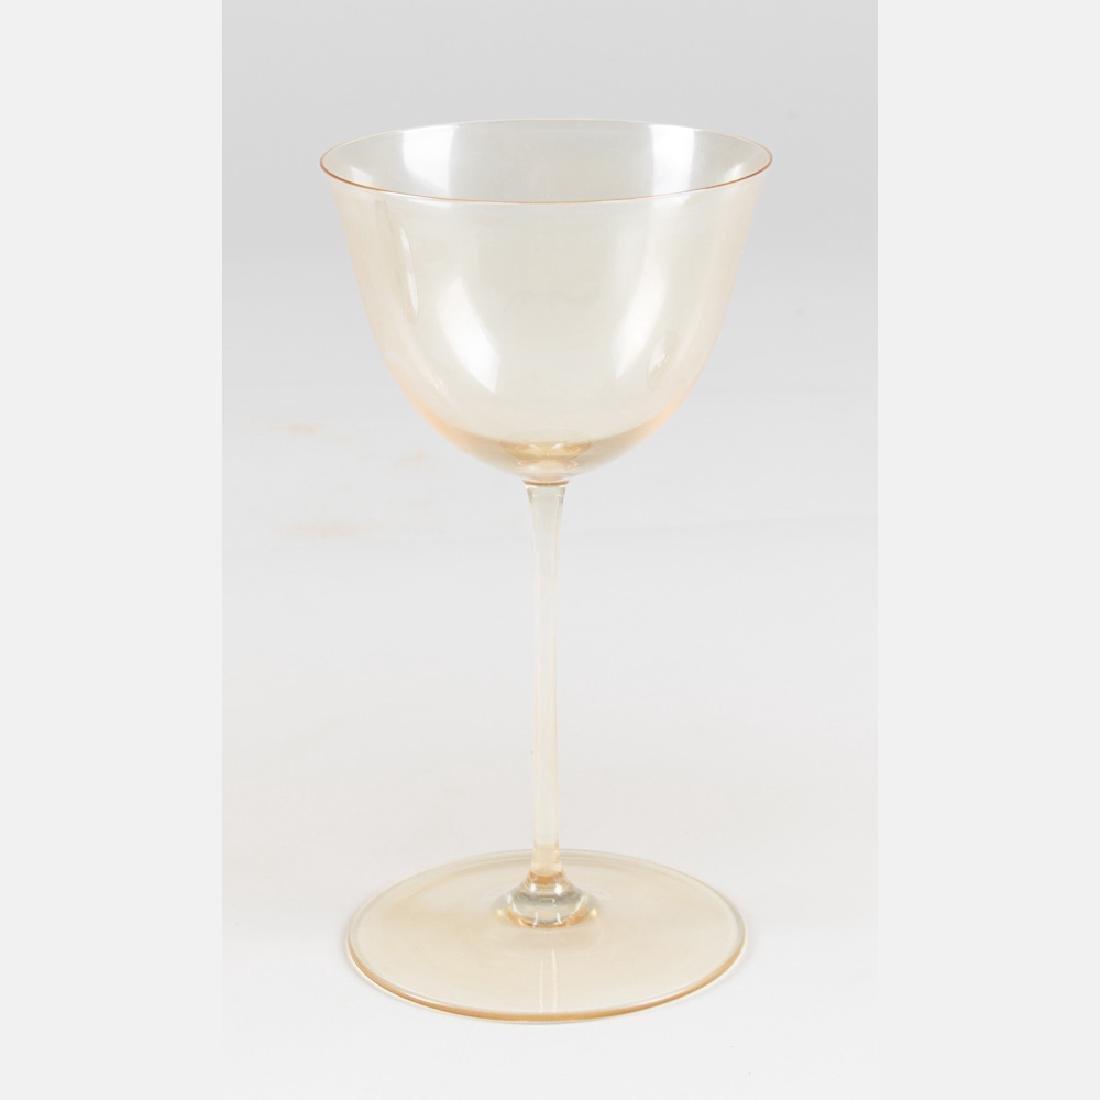 A Set of Blown Glass Stemware by J. & L. Lobmeyr - 4